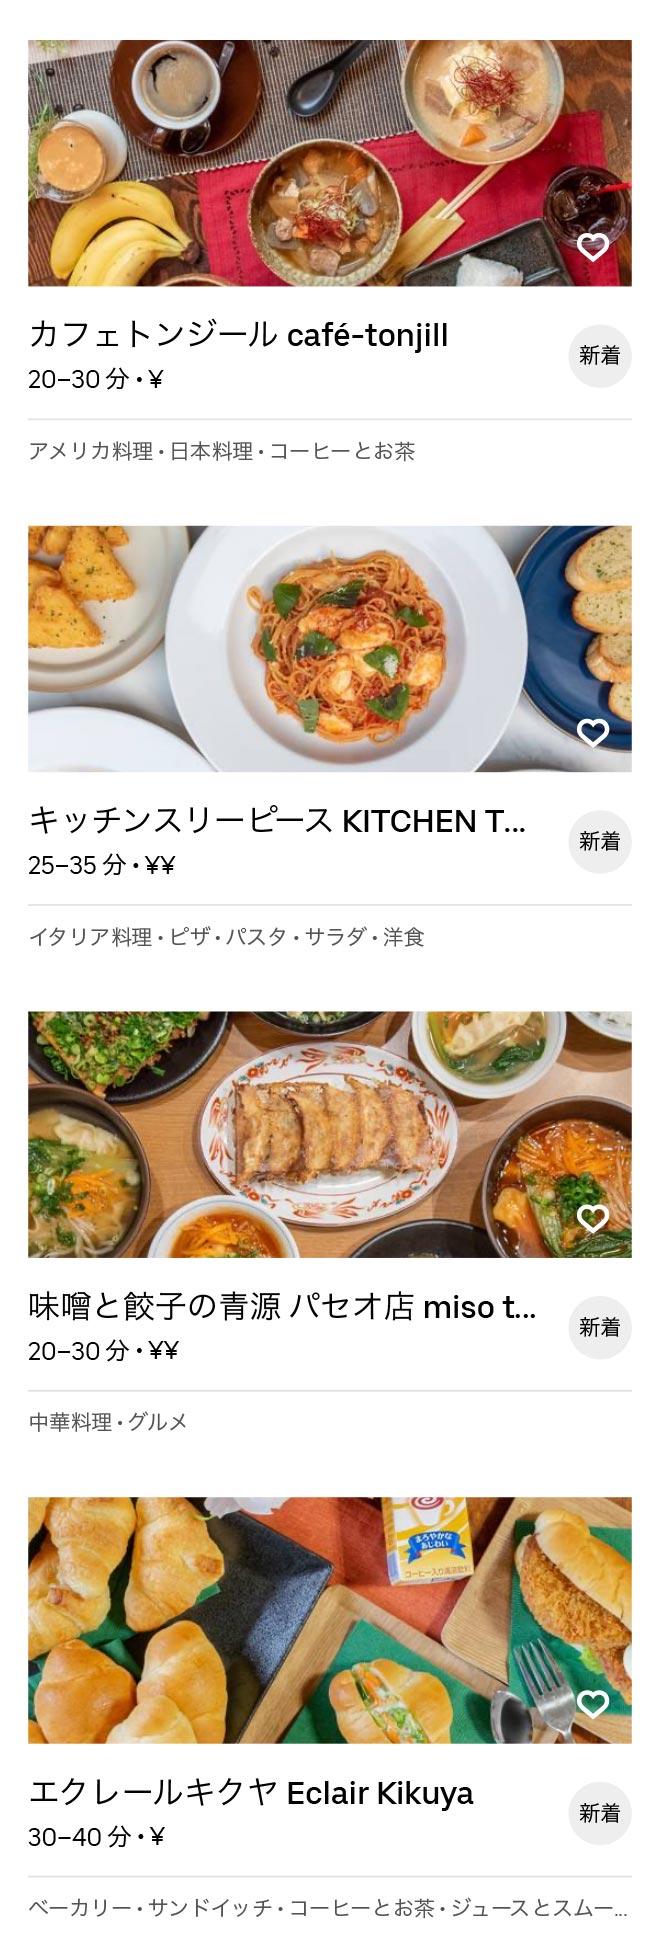 Utsunomiya menu 200609